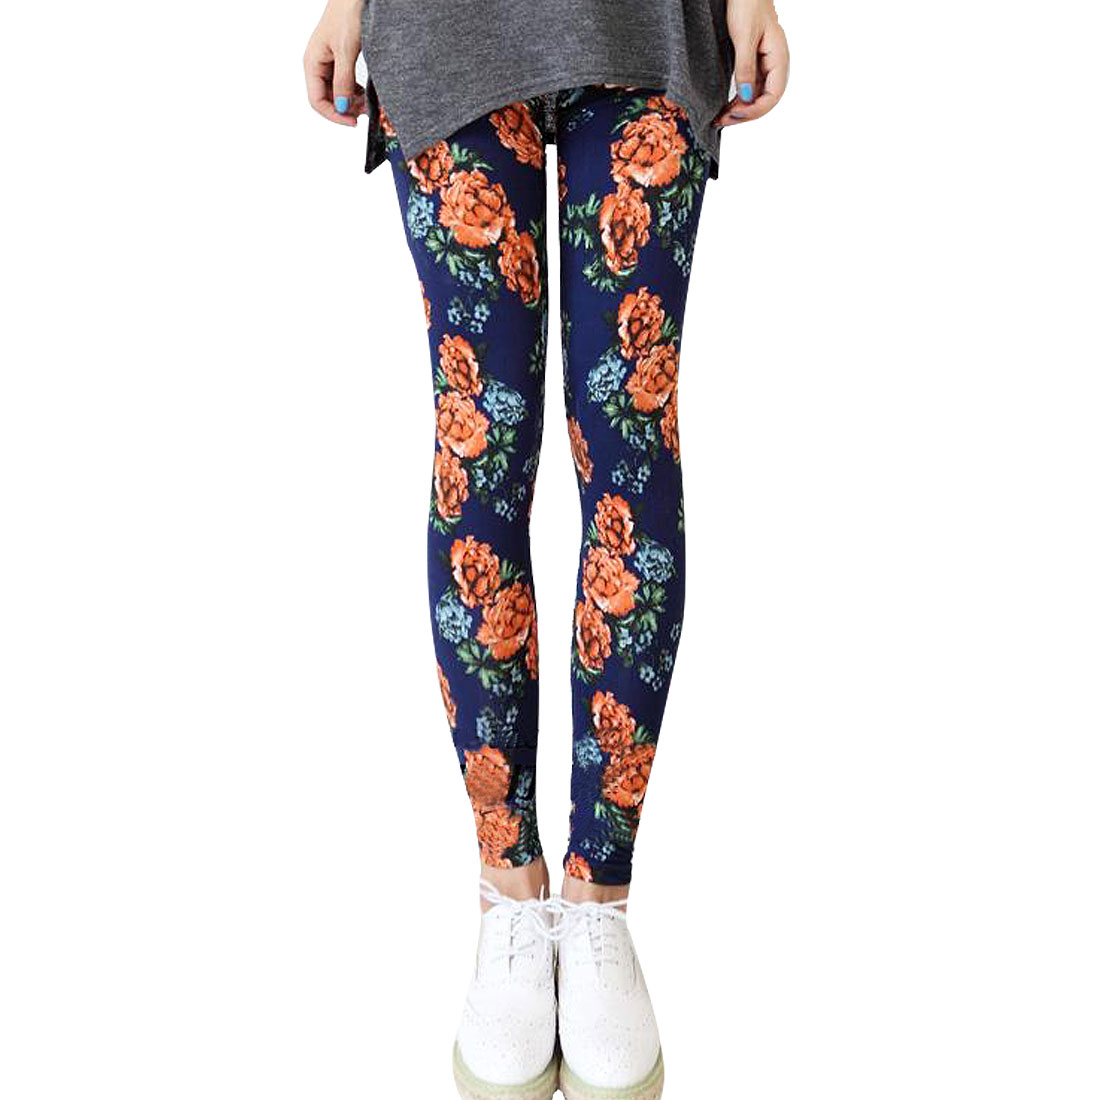 Women Floral Pattern Close-fitting Scrawl Slim Leggings Navy Blue XS